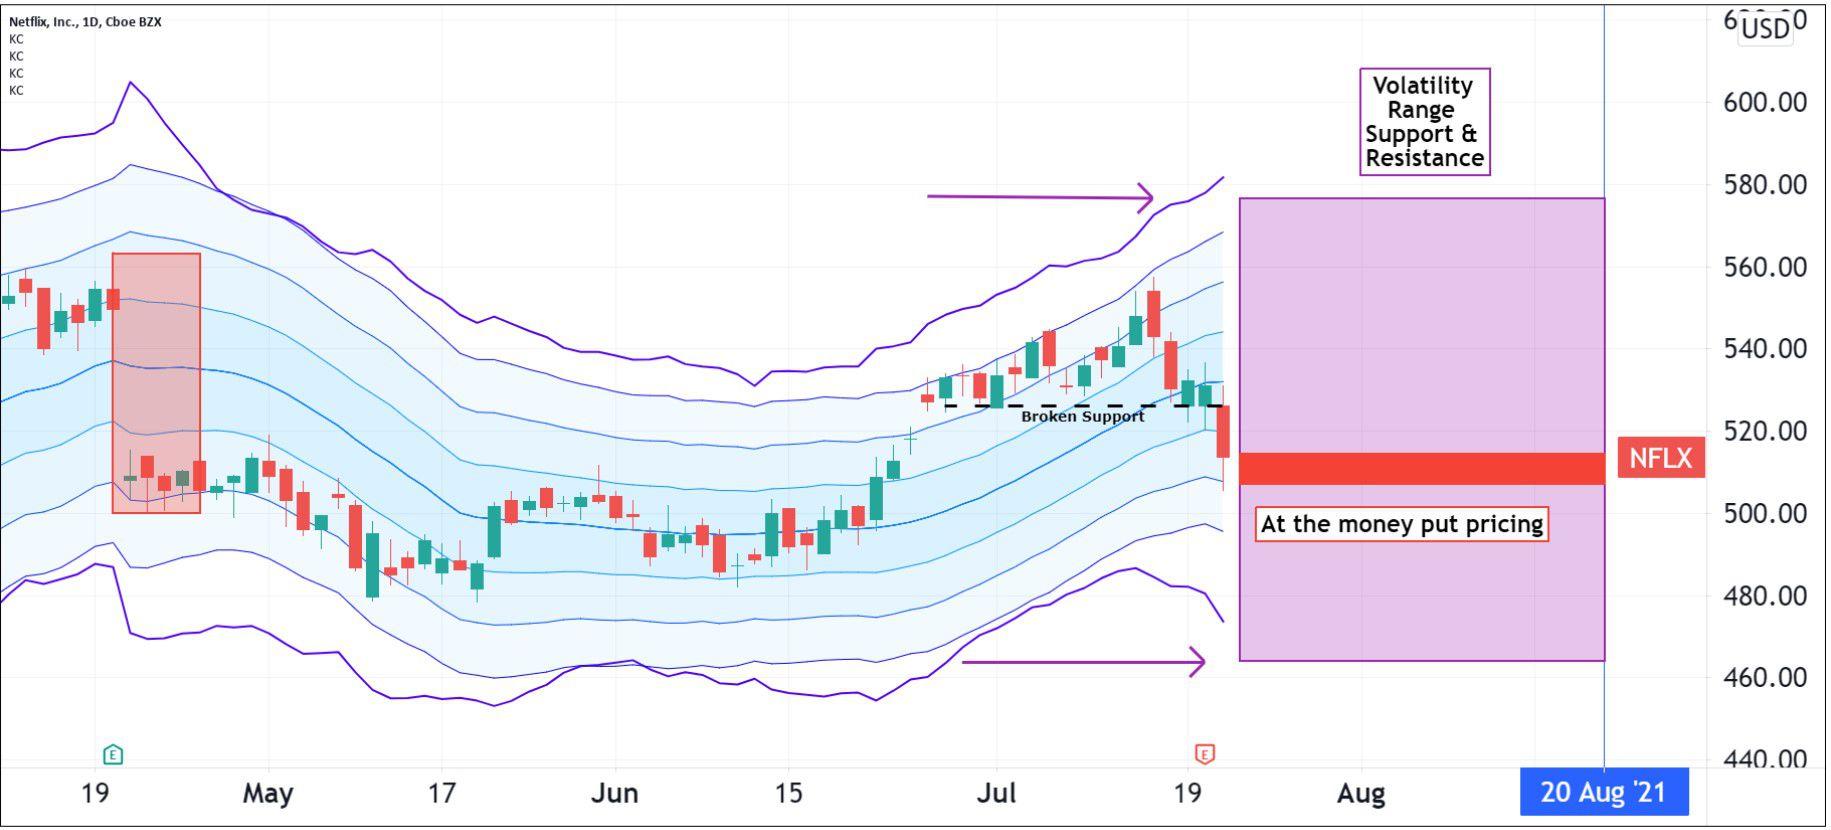 Volatility pattern for Netflix, Inc. (NFLX)